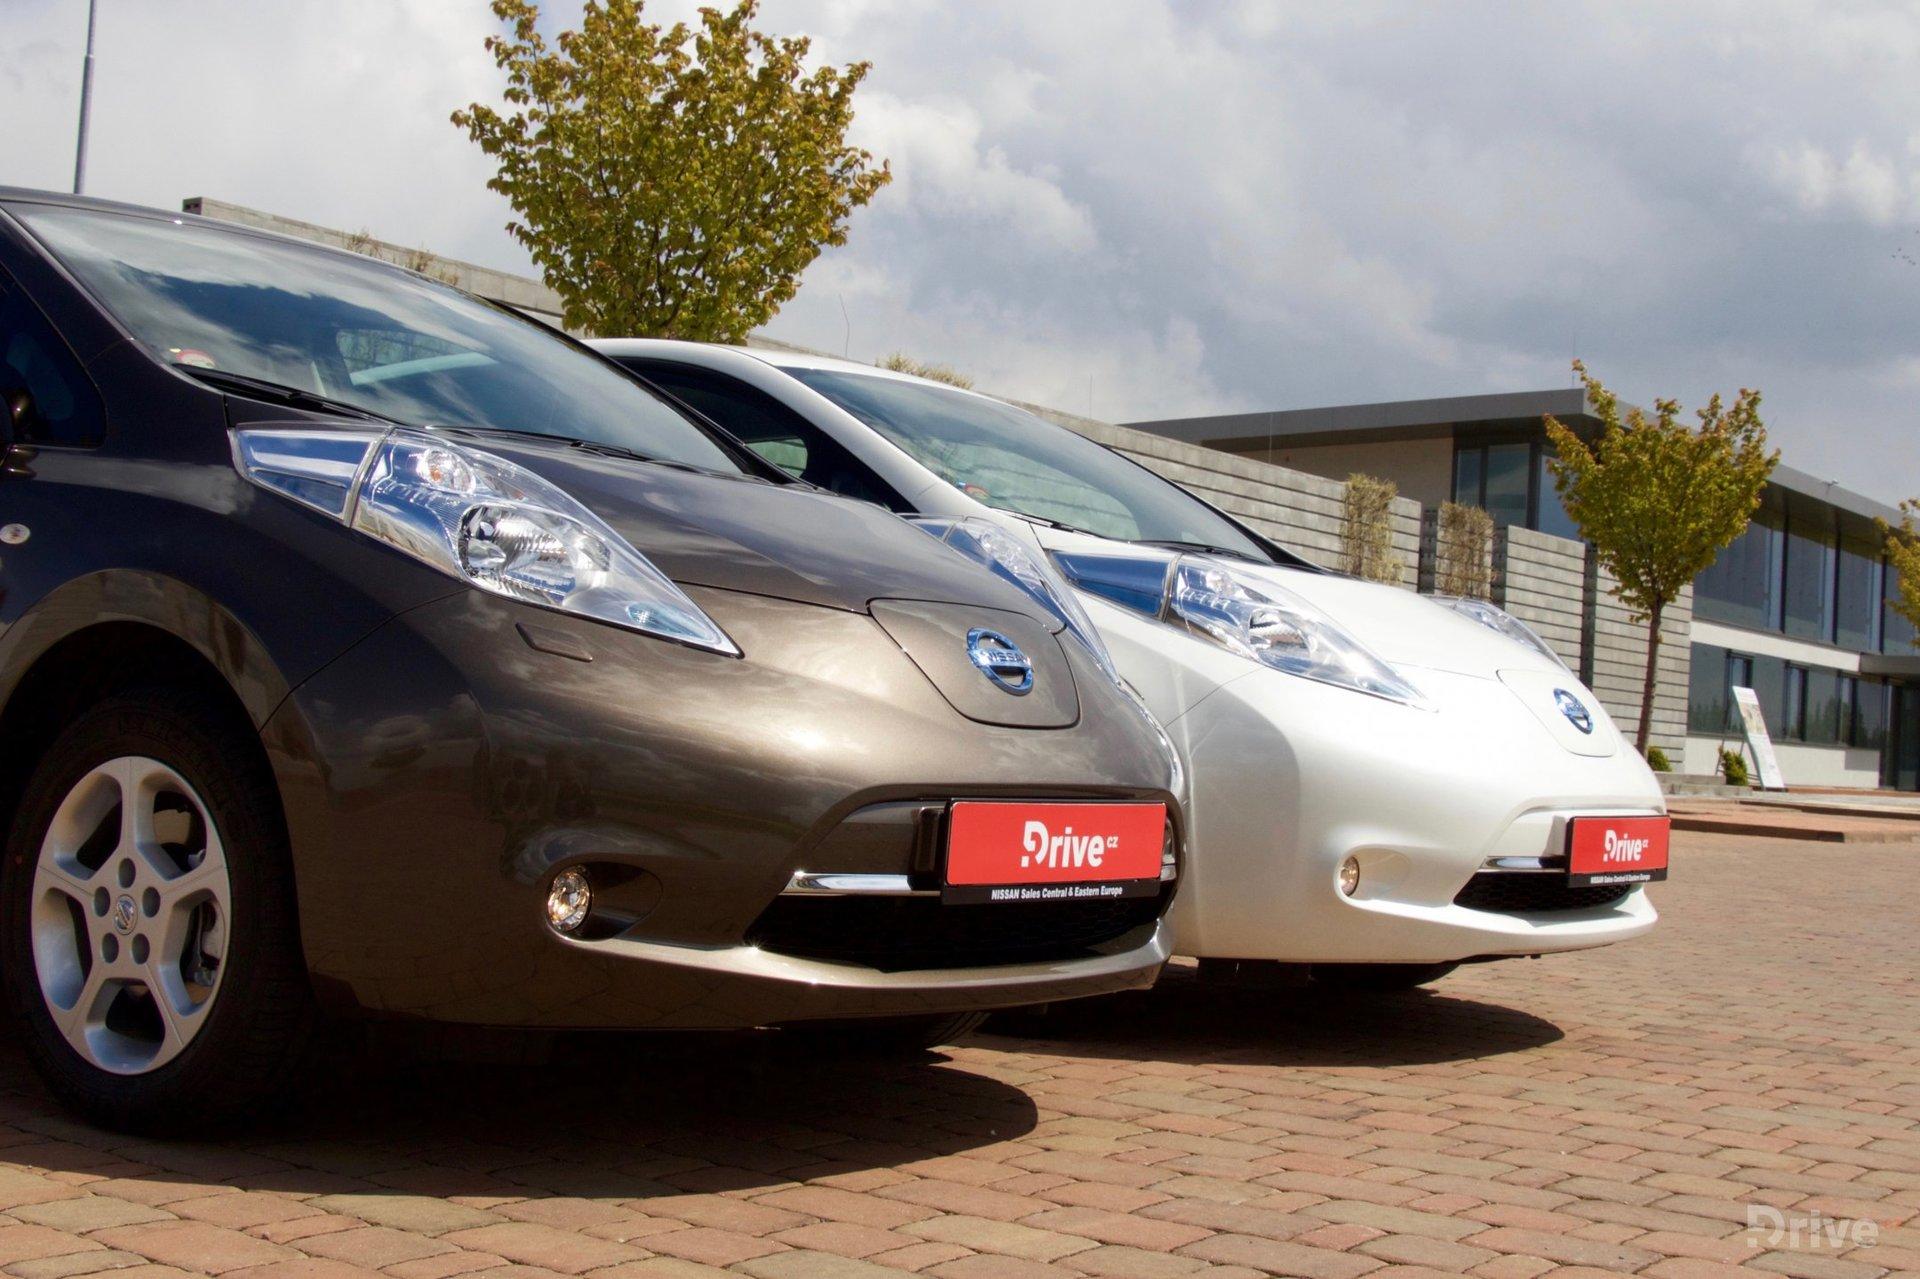 Nissan Leaf 30 kWh vs Leaf 24 kWh